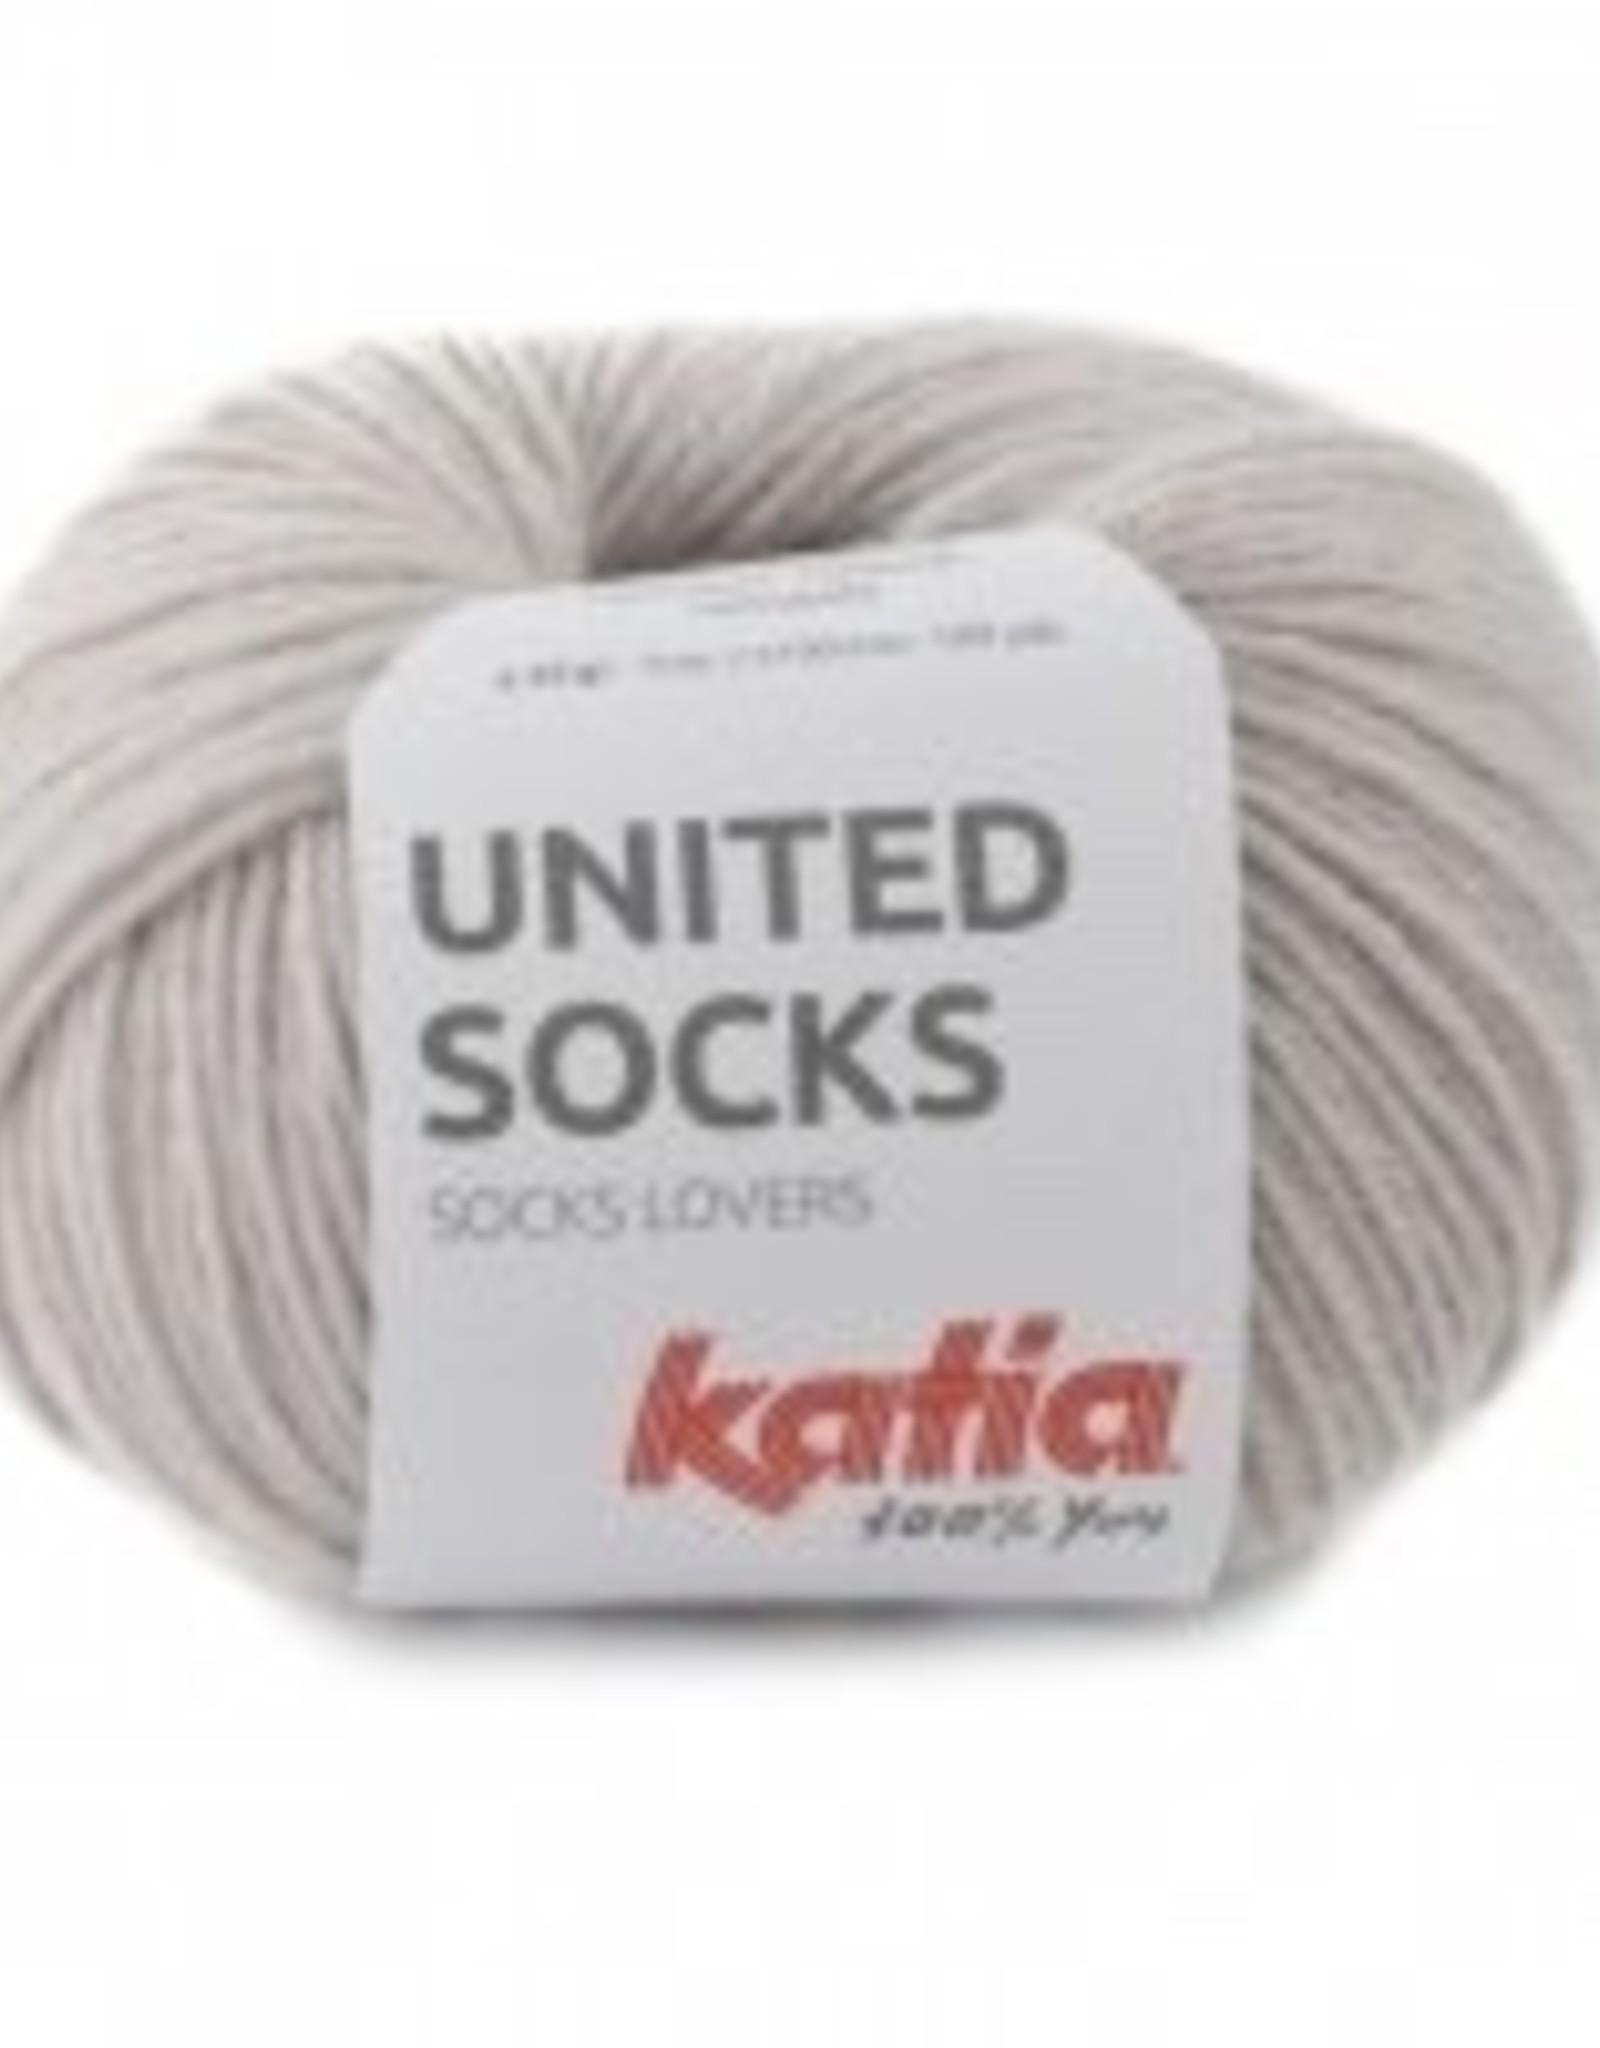 Katia Katia United Socks -  Steengrijs -7-